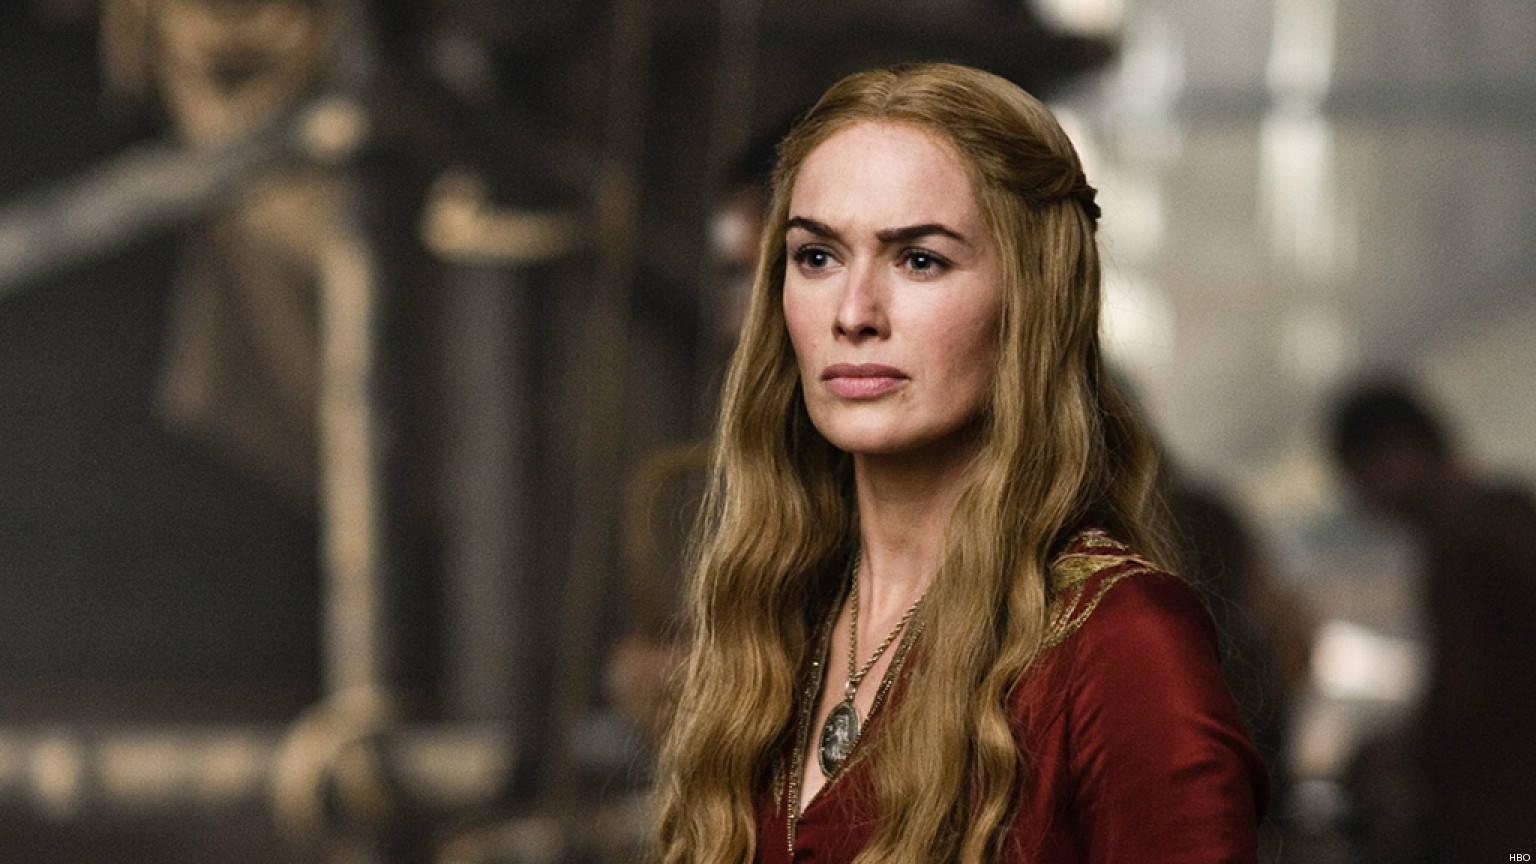 Game of Thrones Cersei Lannister Reduced Liposomal Glutathione